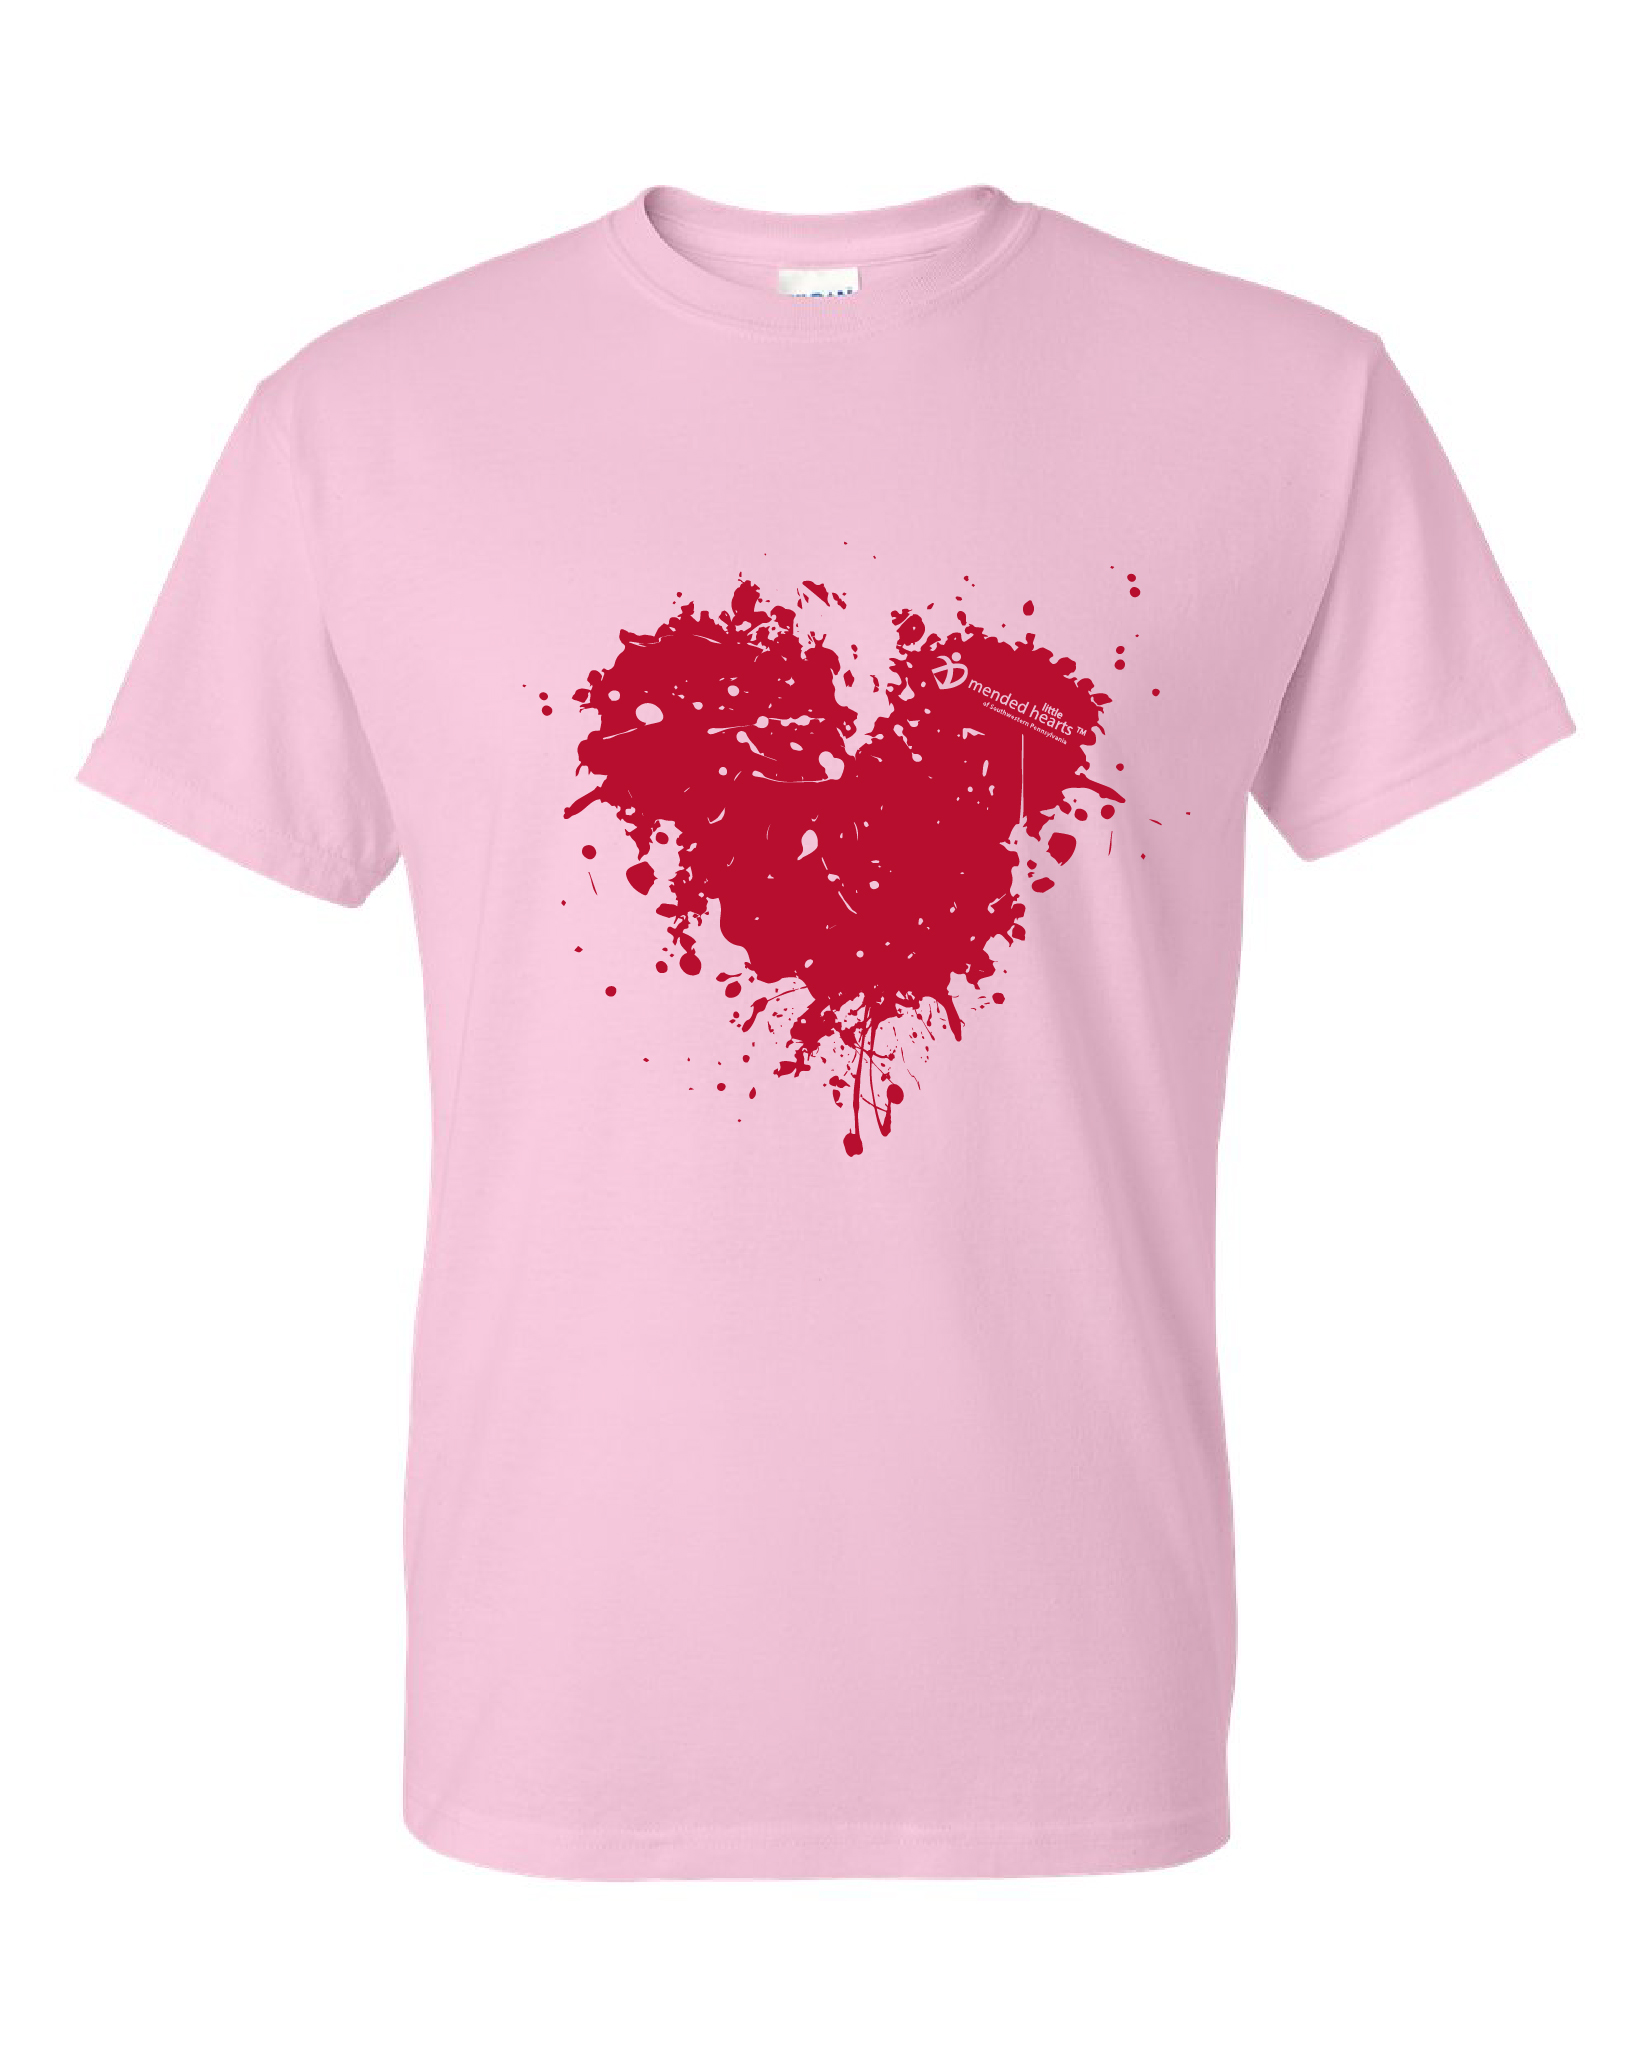 Splatter Heart Available in Multiple Colors